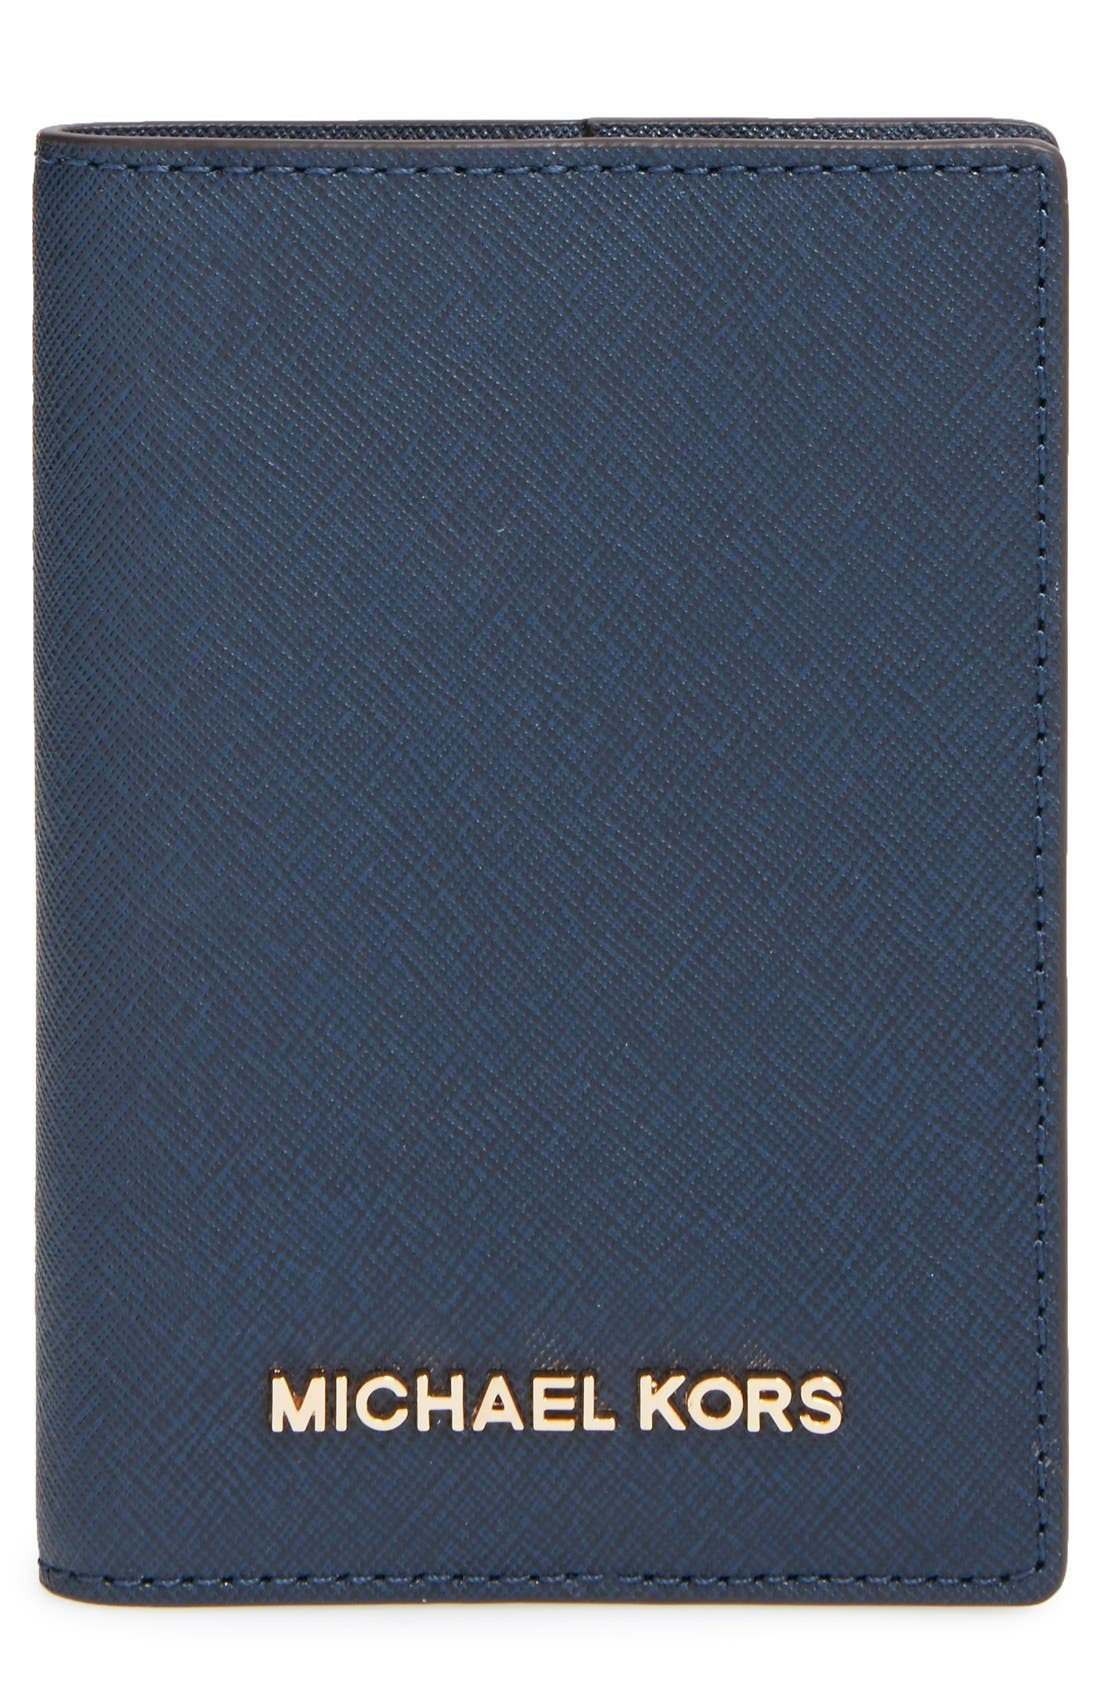 Alternate Image 1 Selected - MICHAEL Michael Kors'Jet Set' Passport Case